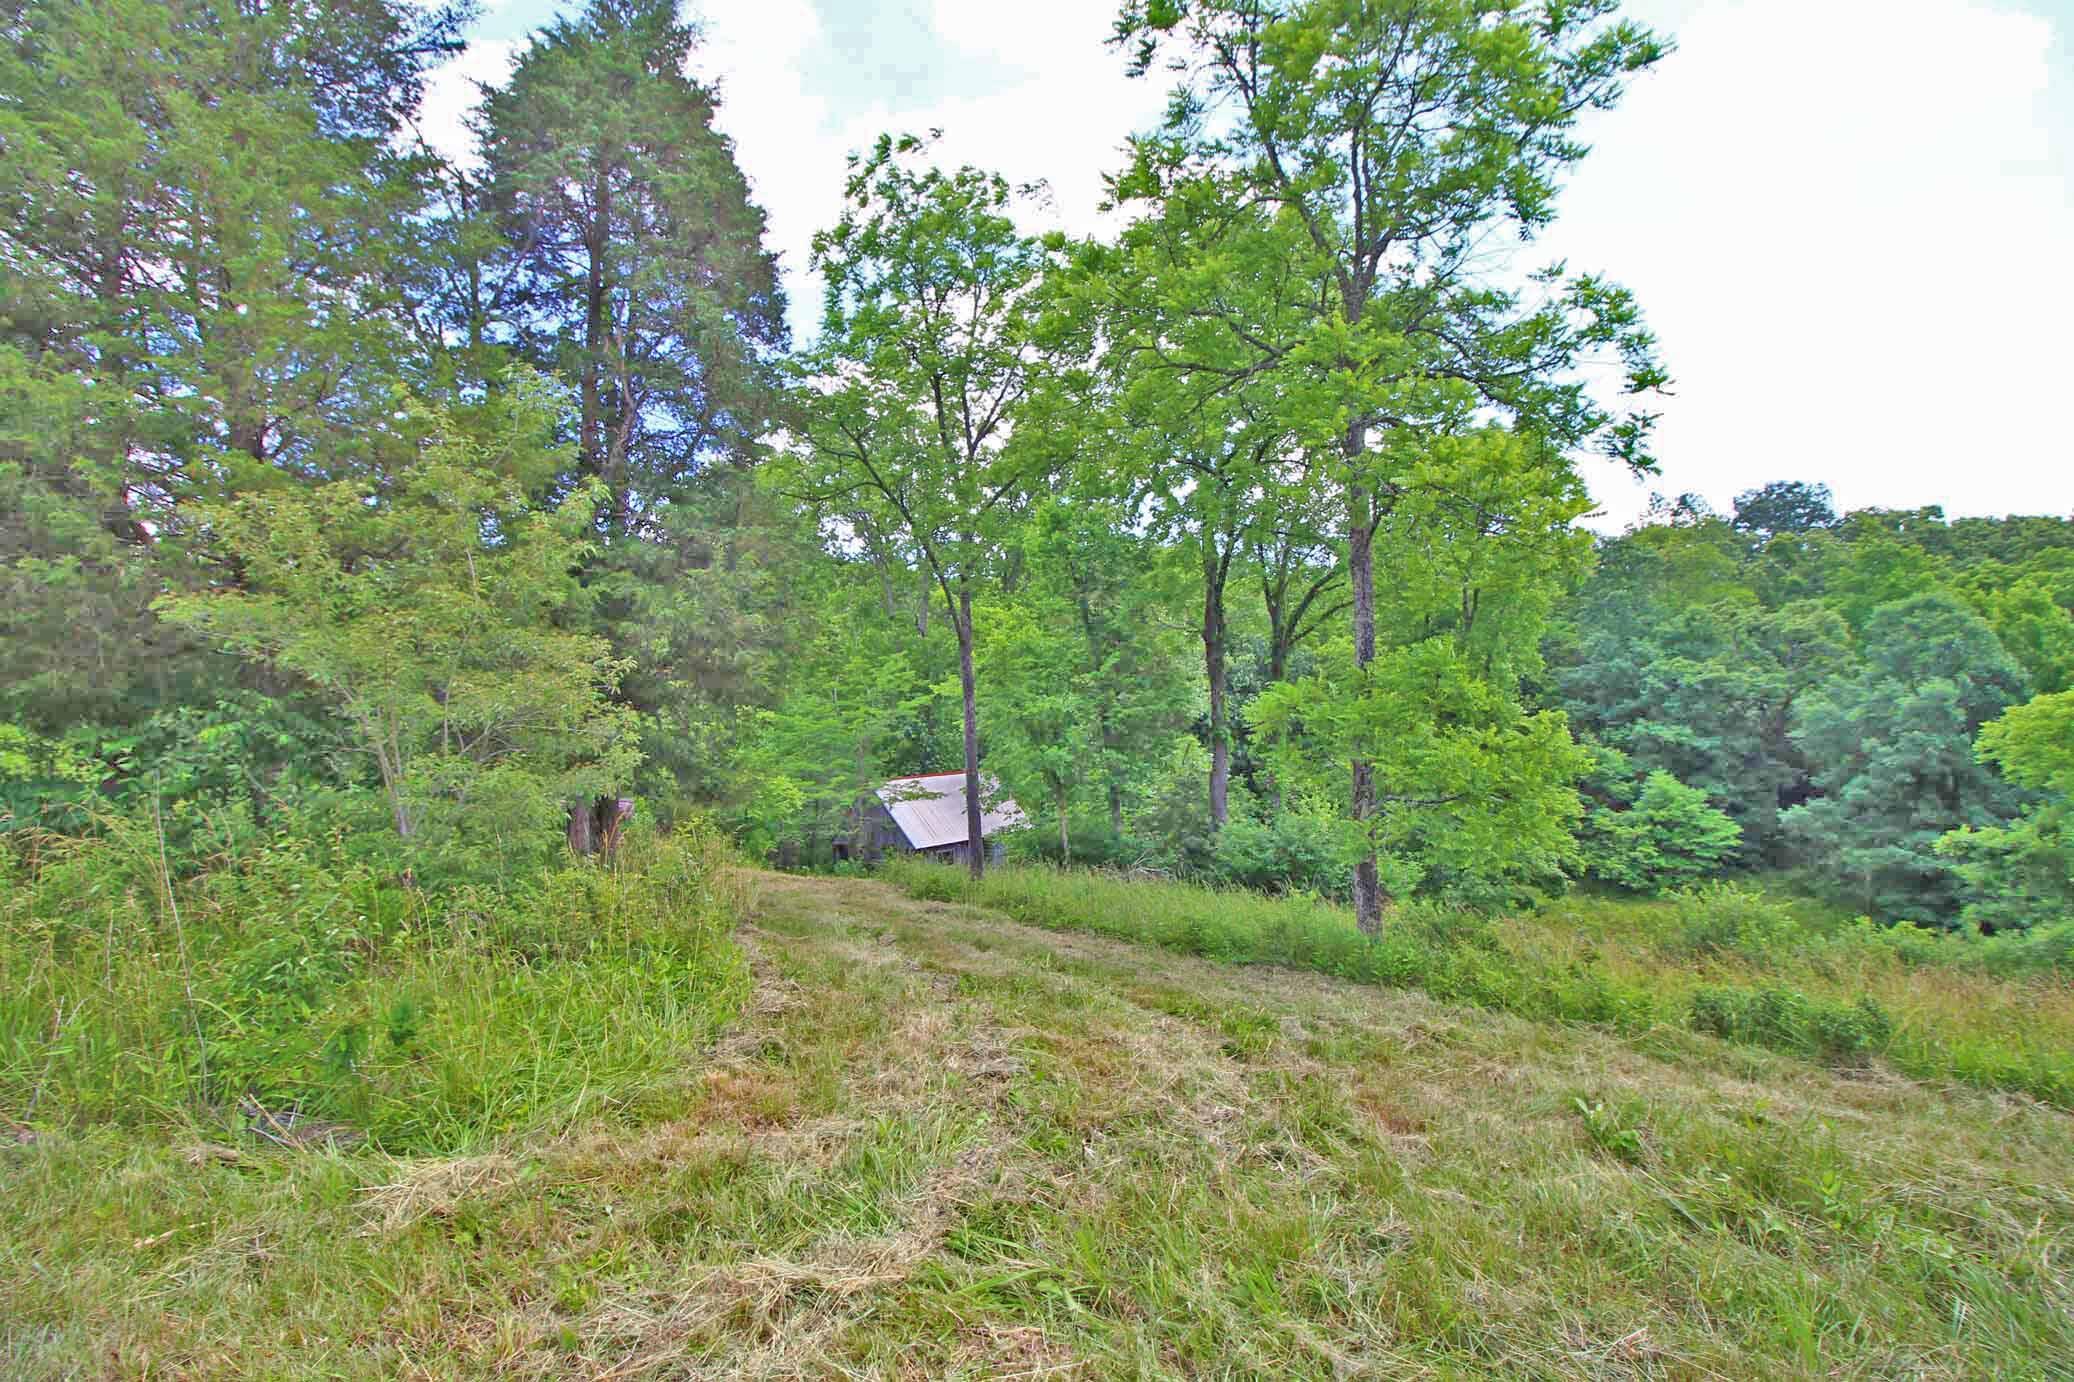 4200 Mink Run Road, Shelbyville, KY 40065